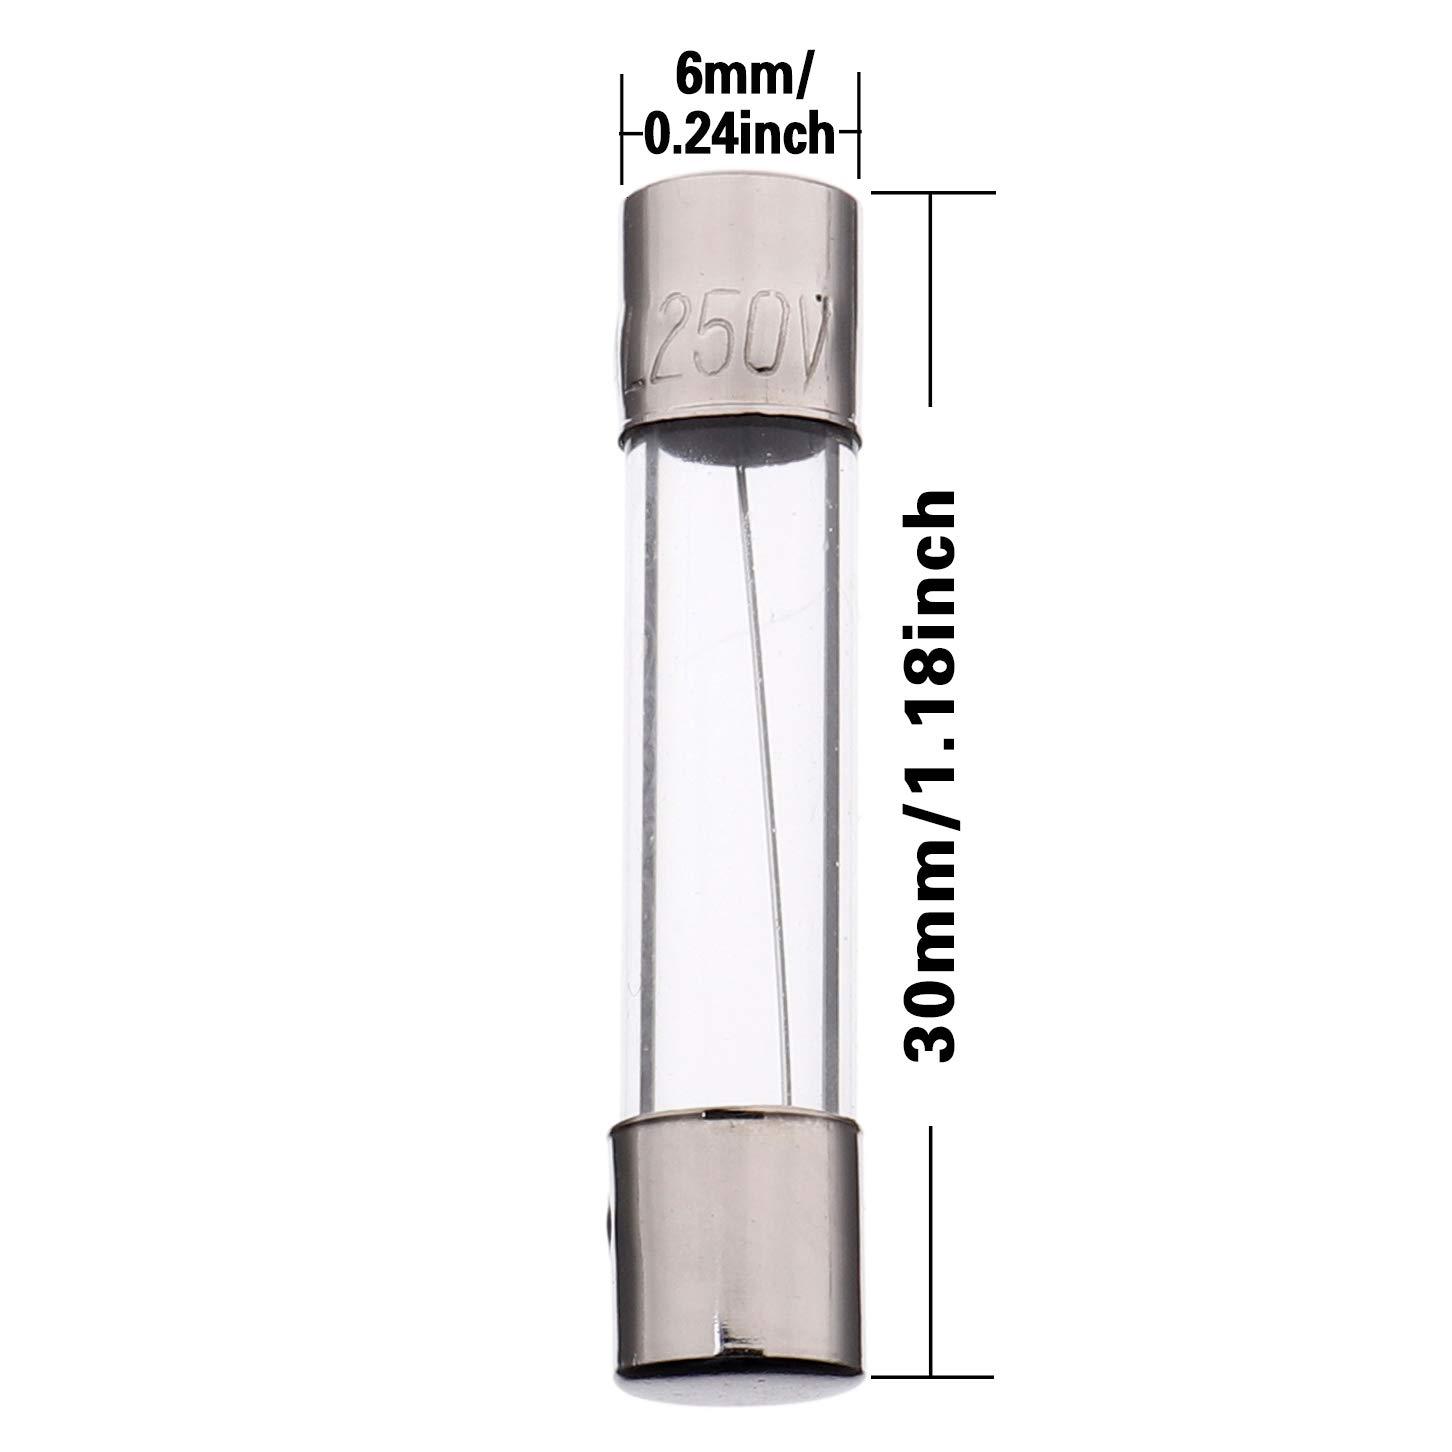 paquete de 18 piezas BOJACK 6x30 mm 0.5 A 250 V 0.24x1.18 pulgadas F0.5AL250V 0.5 amp 250 voltios Fusibles de vidrio de soplado r/ápido